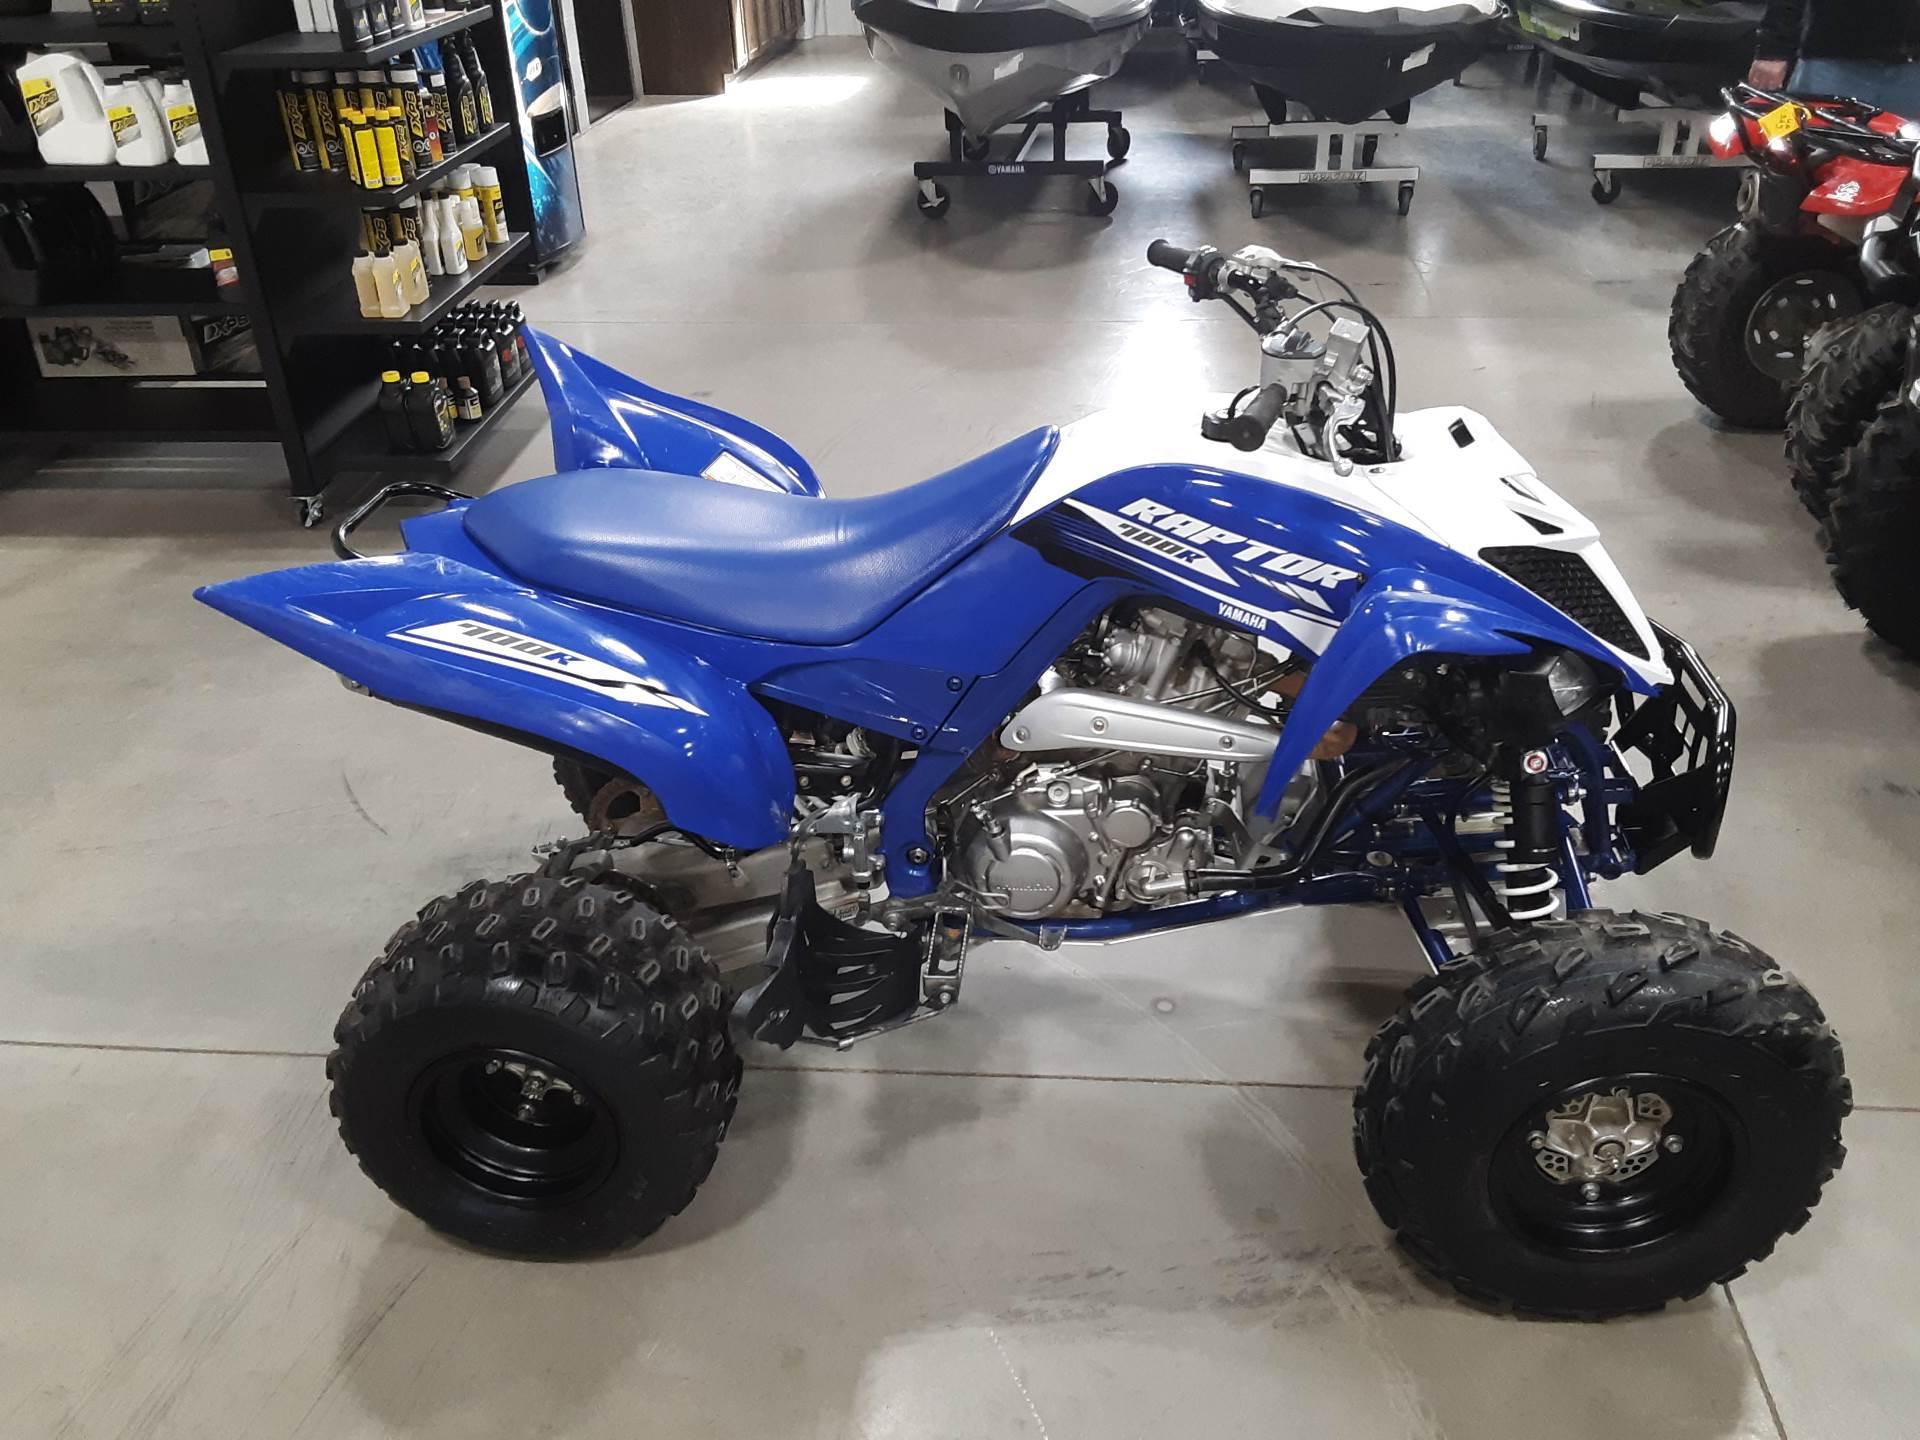 2018 Yamaha Raptor 700R 2